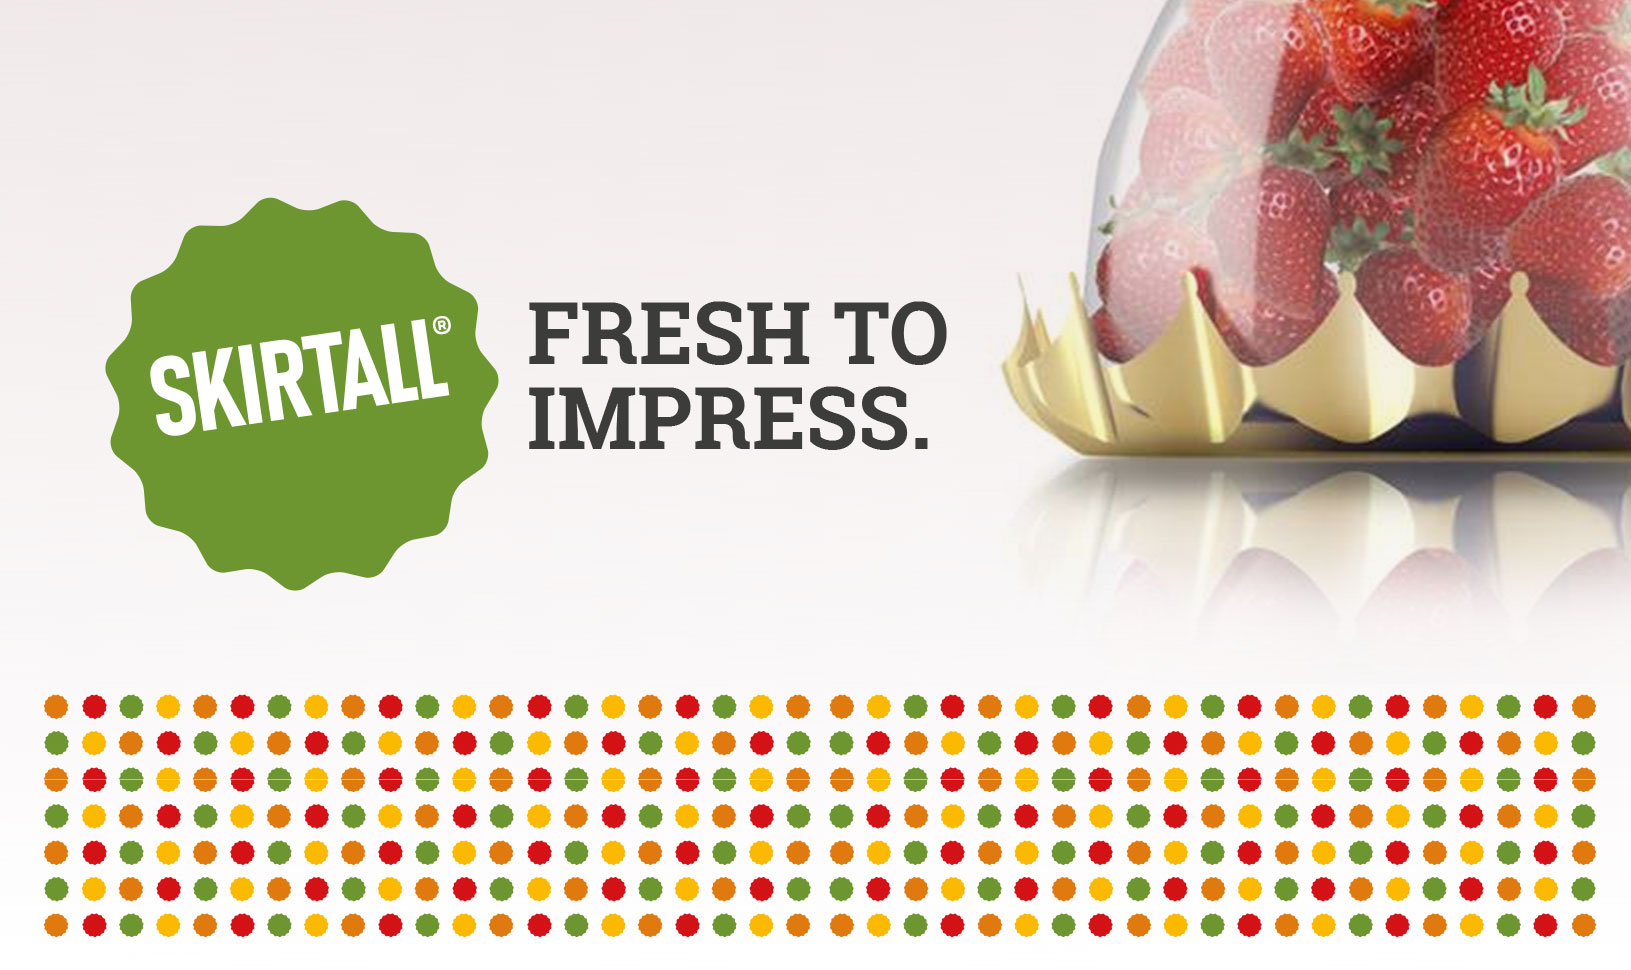 Skirtall, fresh to impress